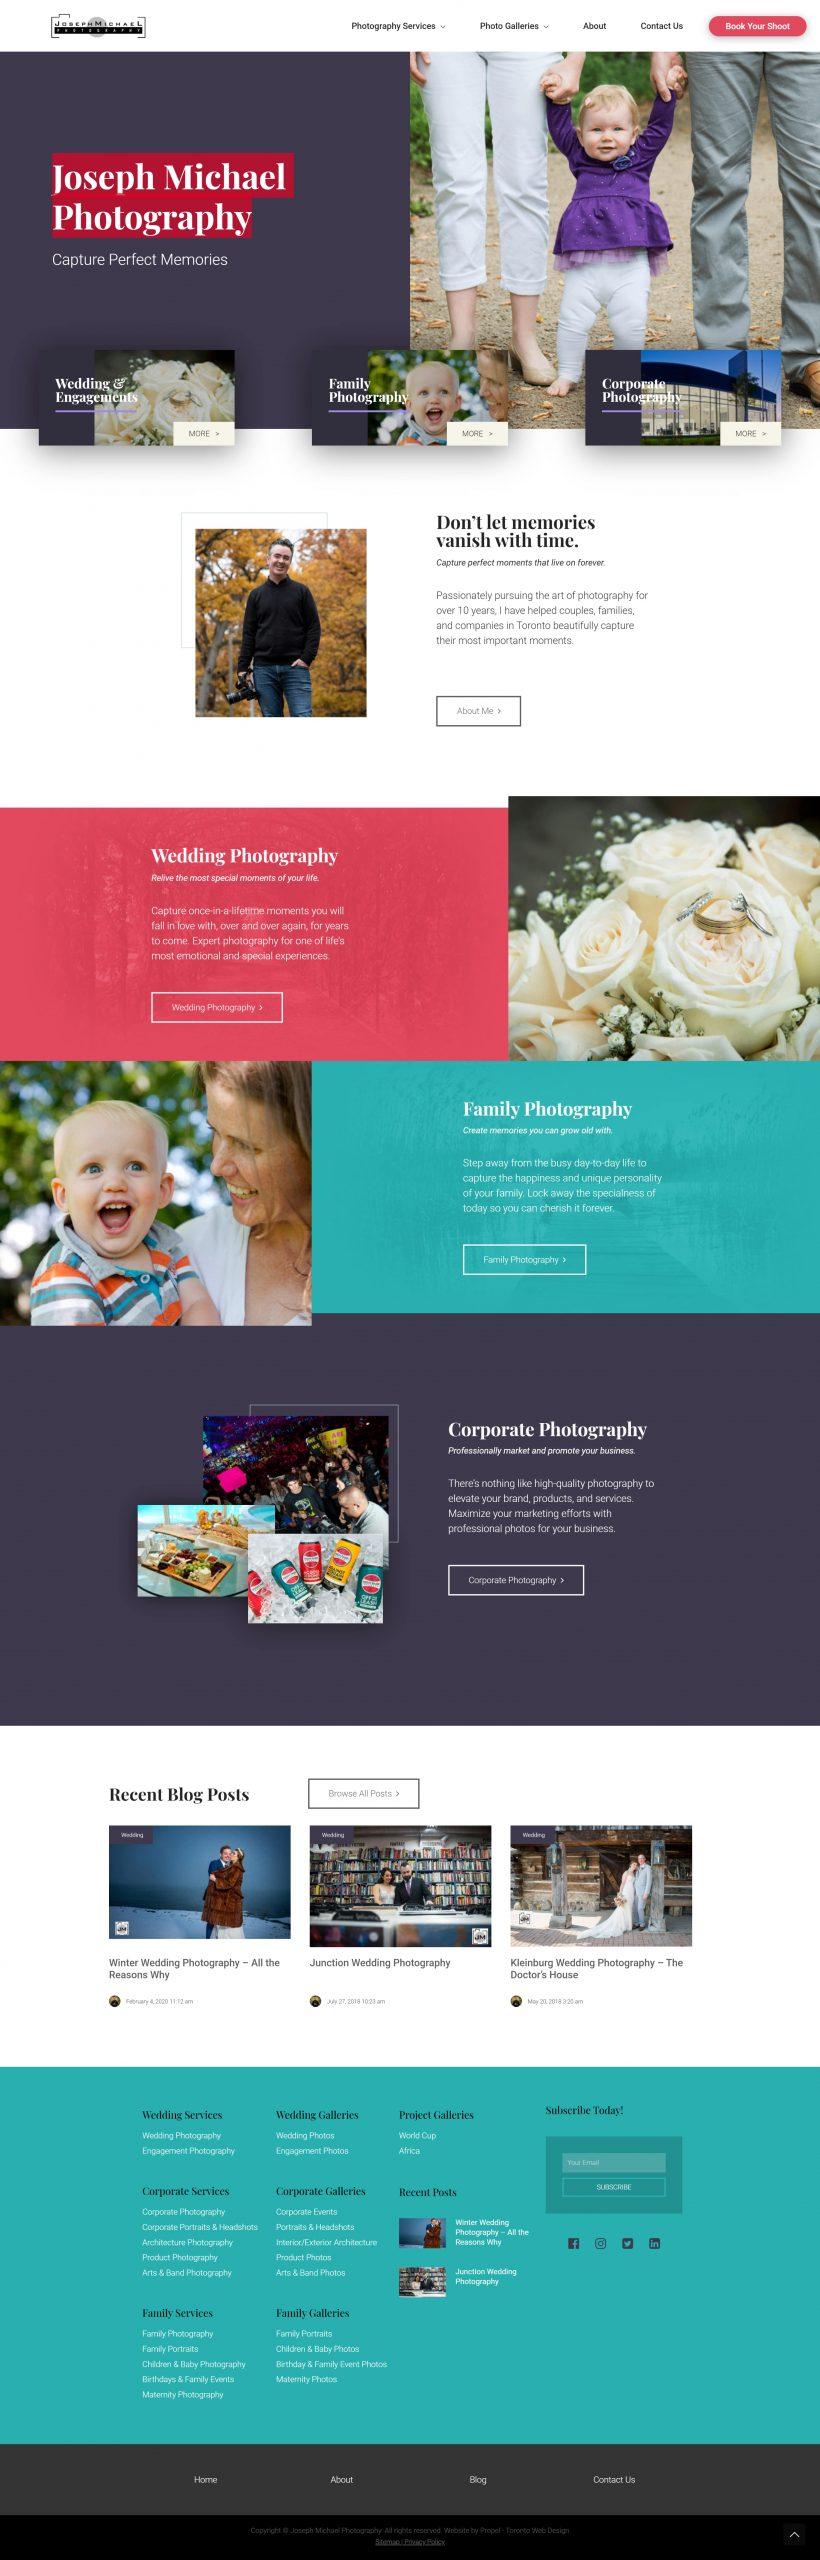 Joseph Michael Photgraphy Website marketing2 min scaled